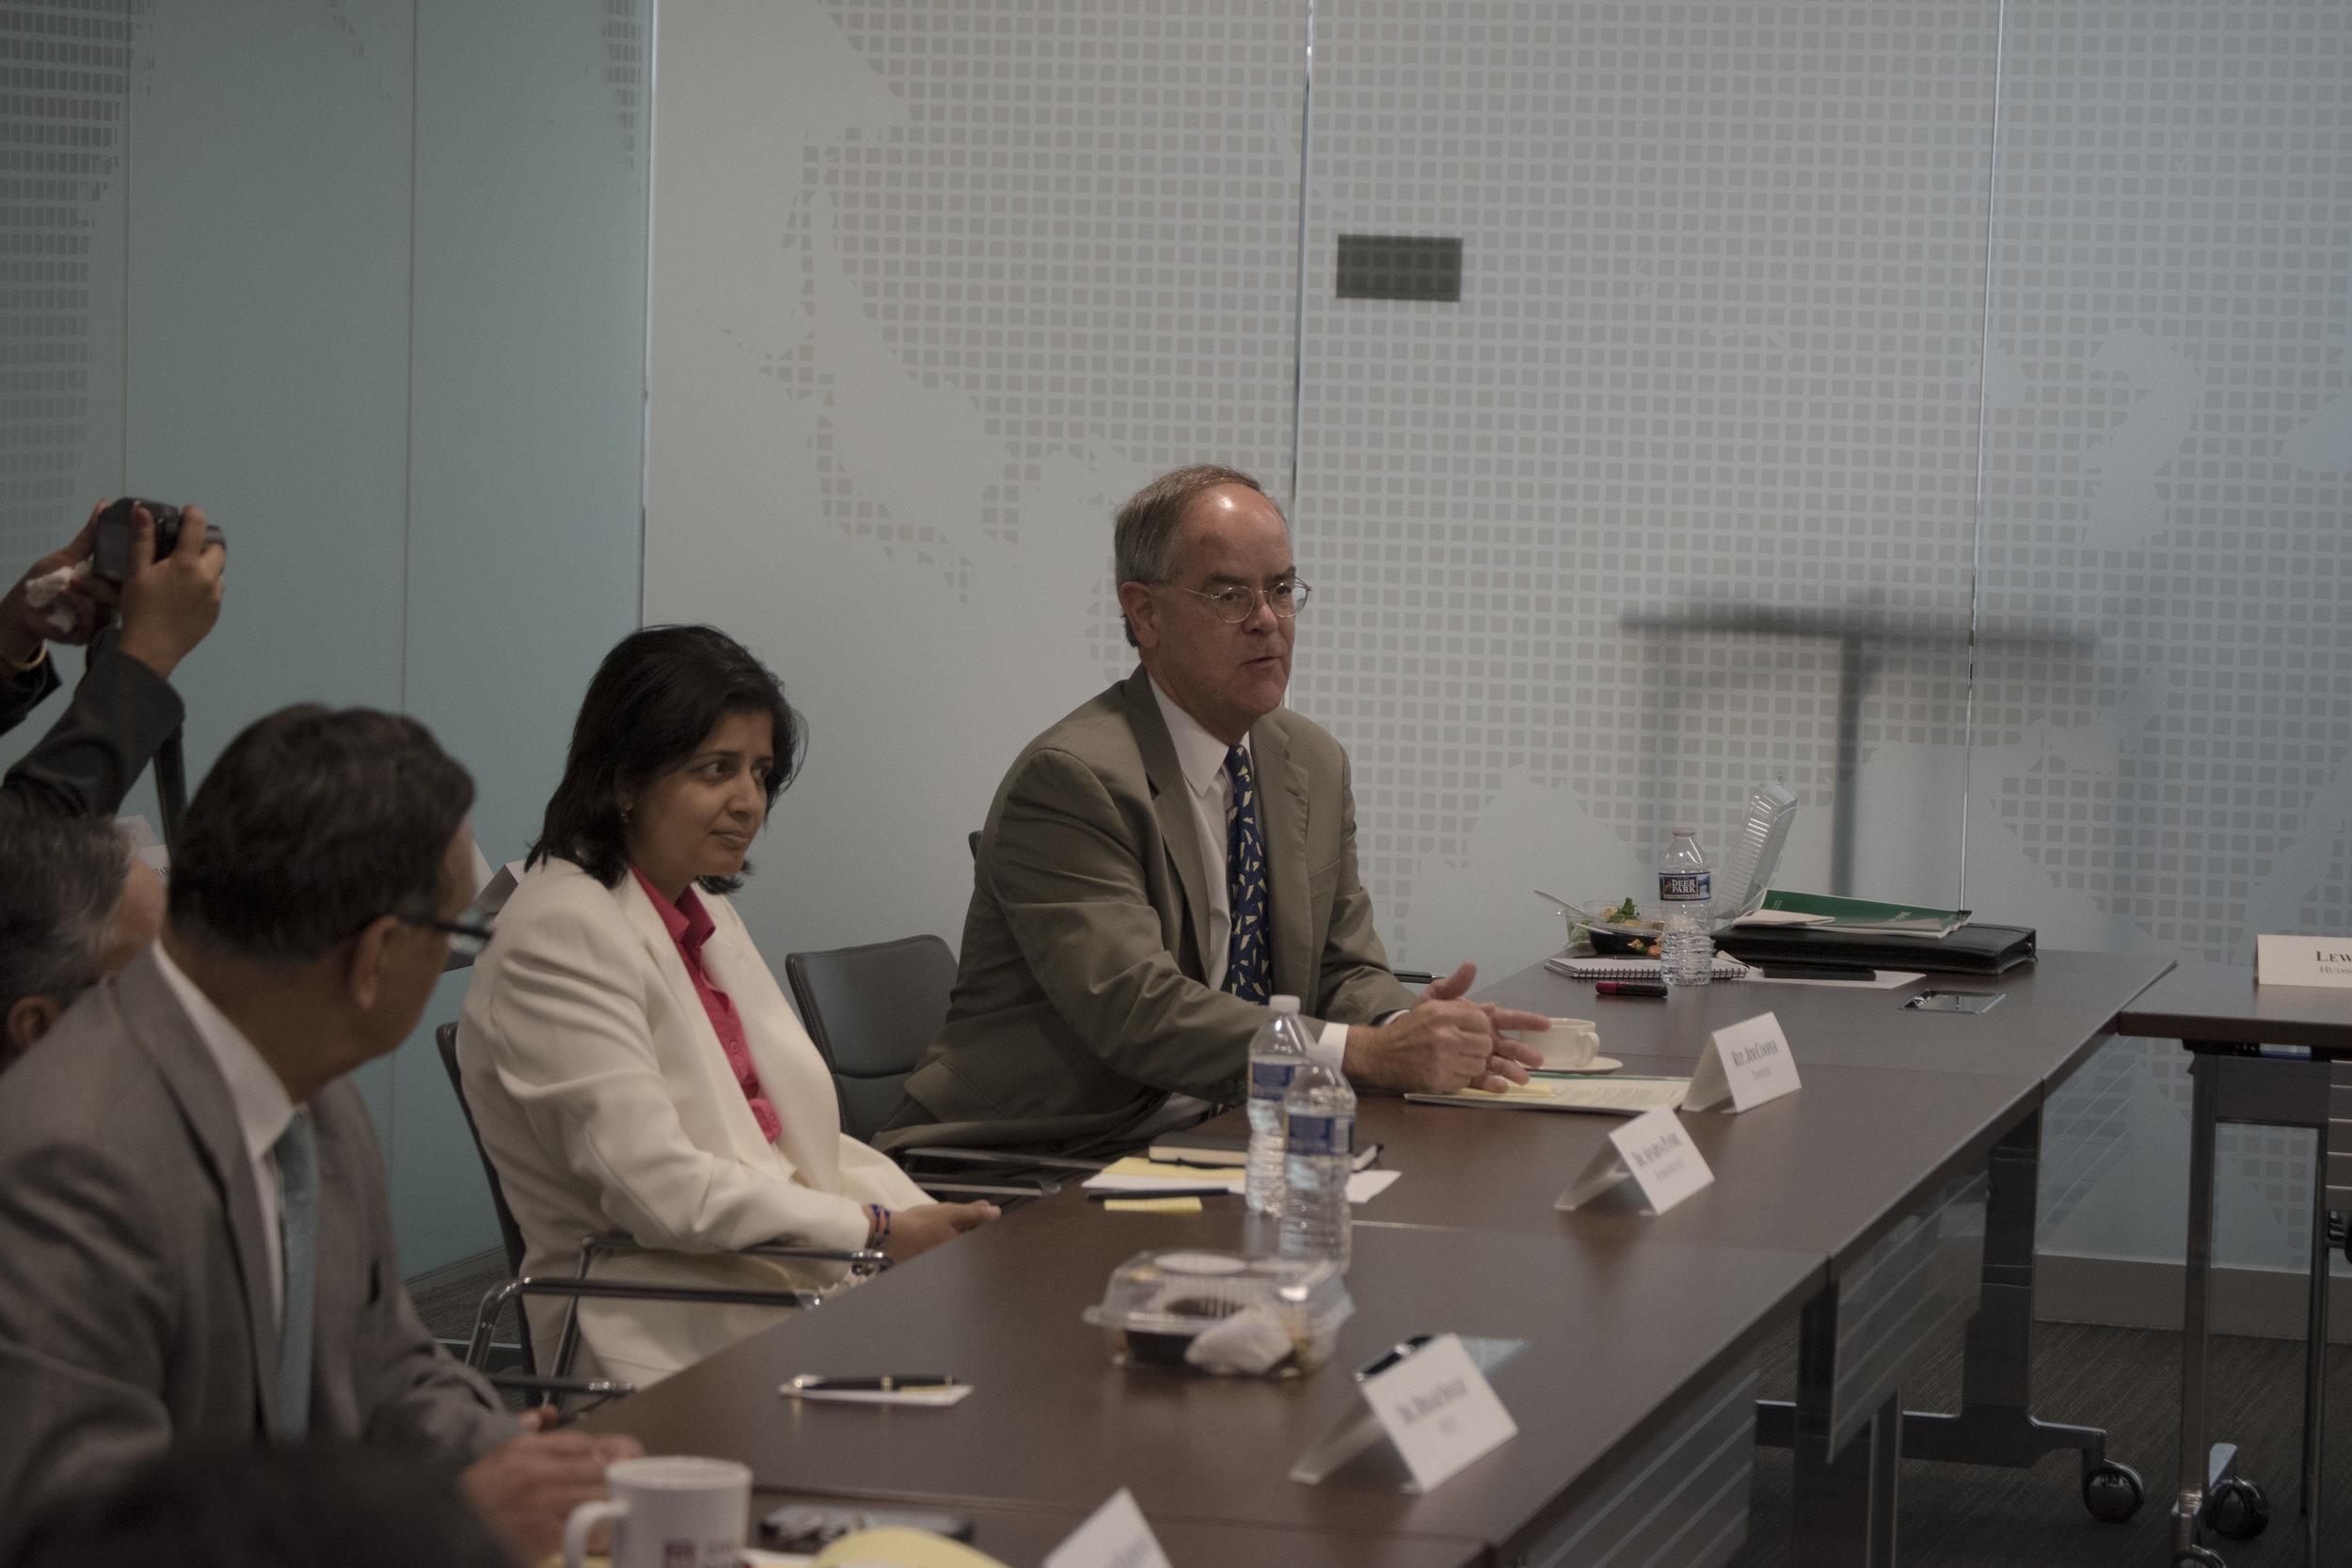 L-R: Ambassador Husain Haqqani, Dr. Aparna Pande, Congressman Jim Cooper